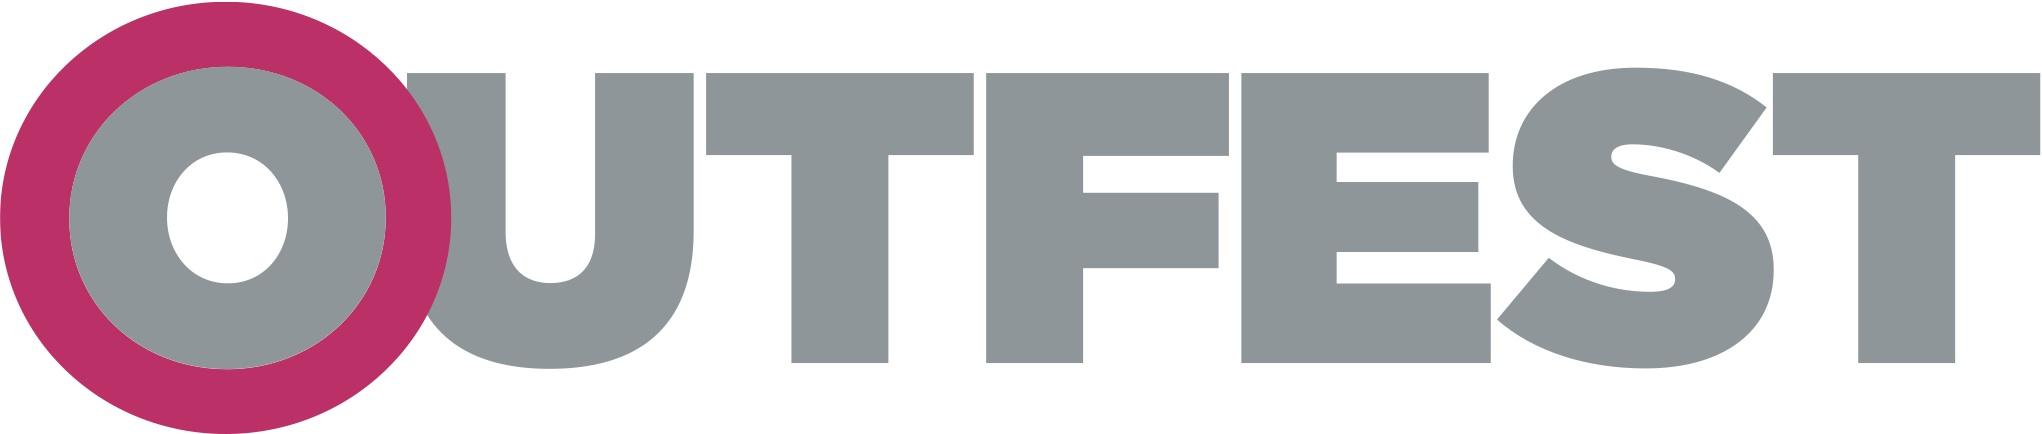 Outfest_Hero_Logo.jpeg